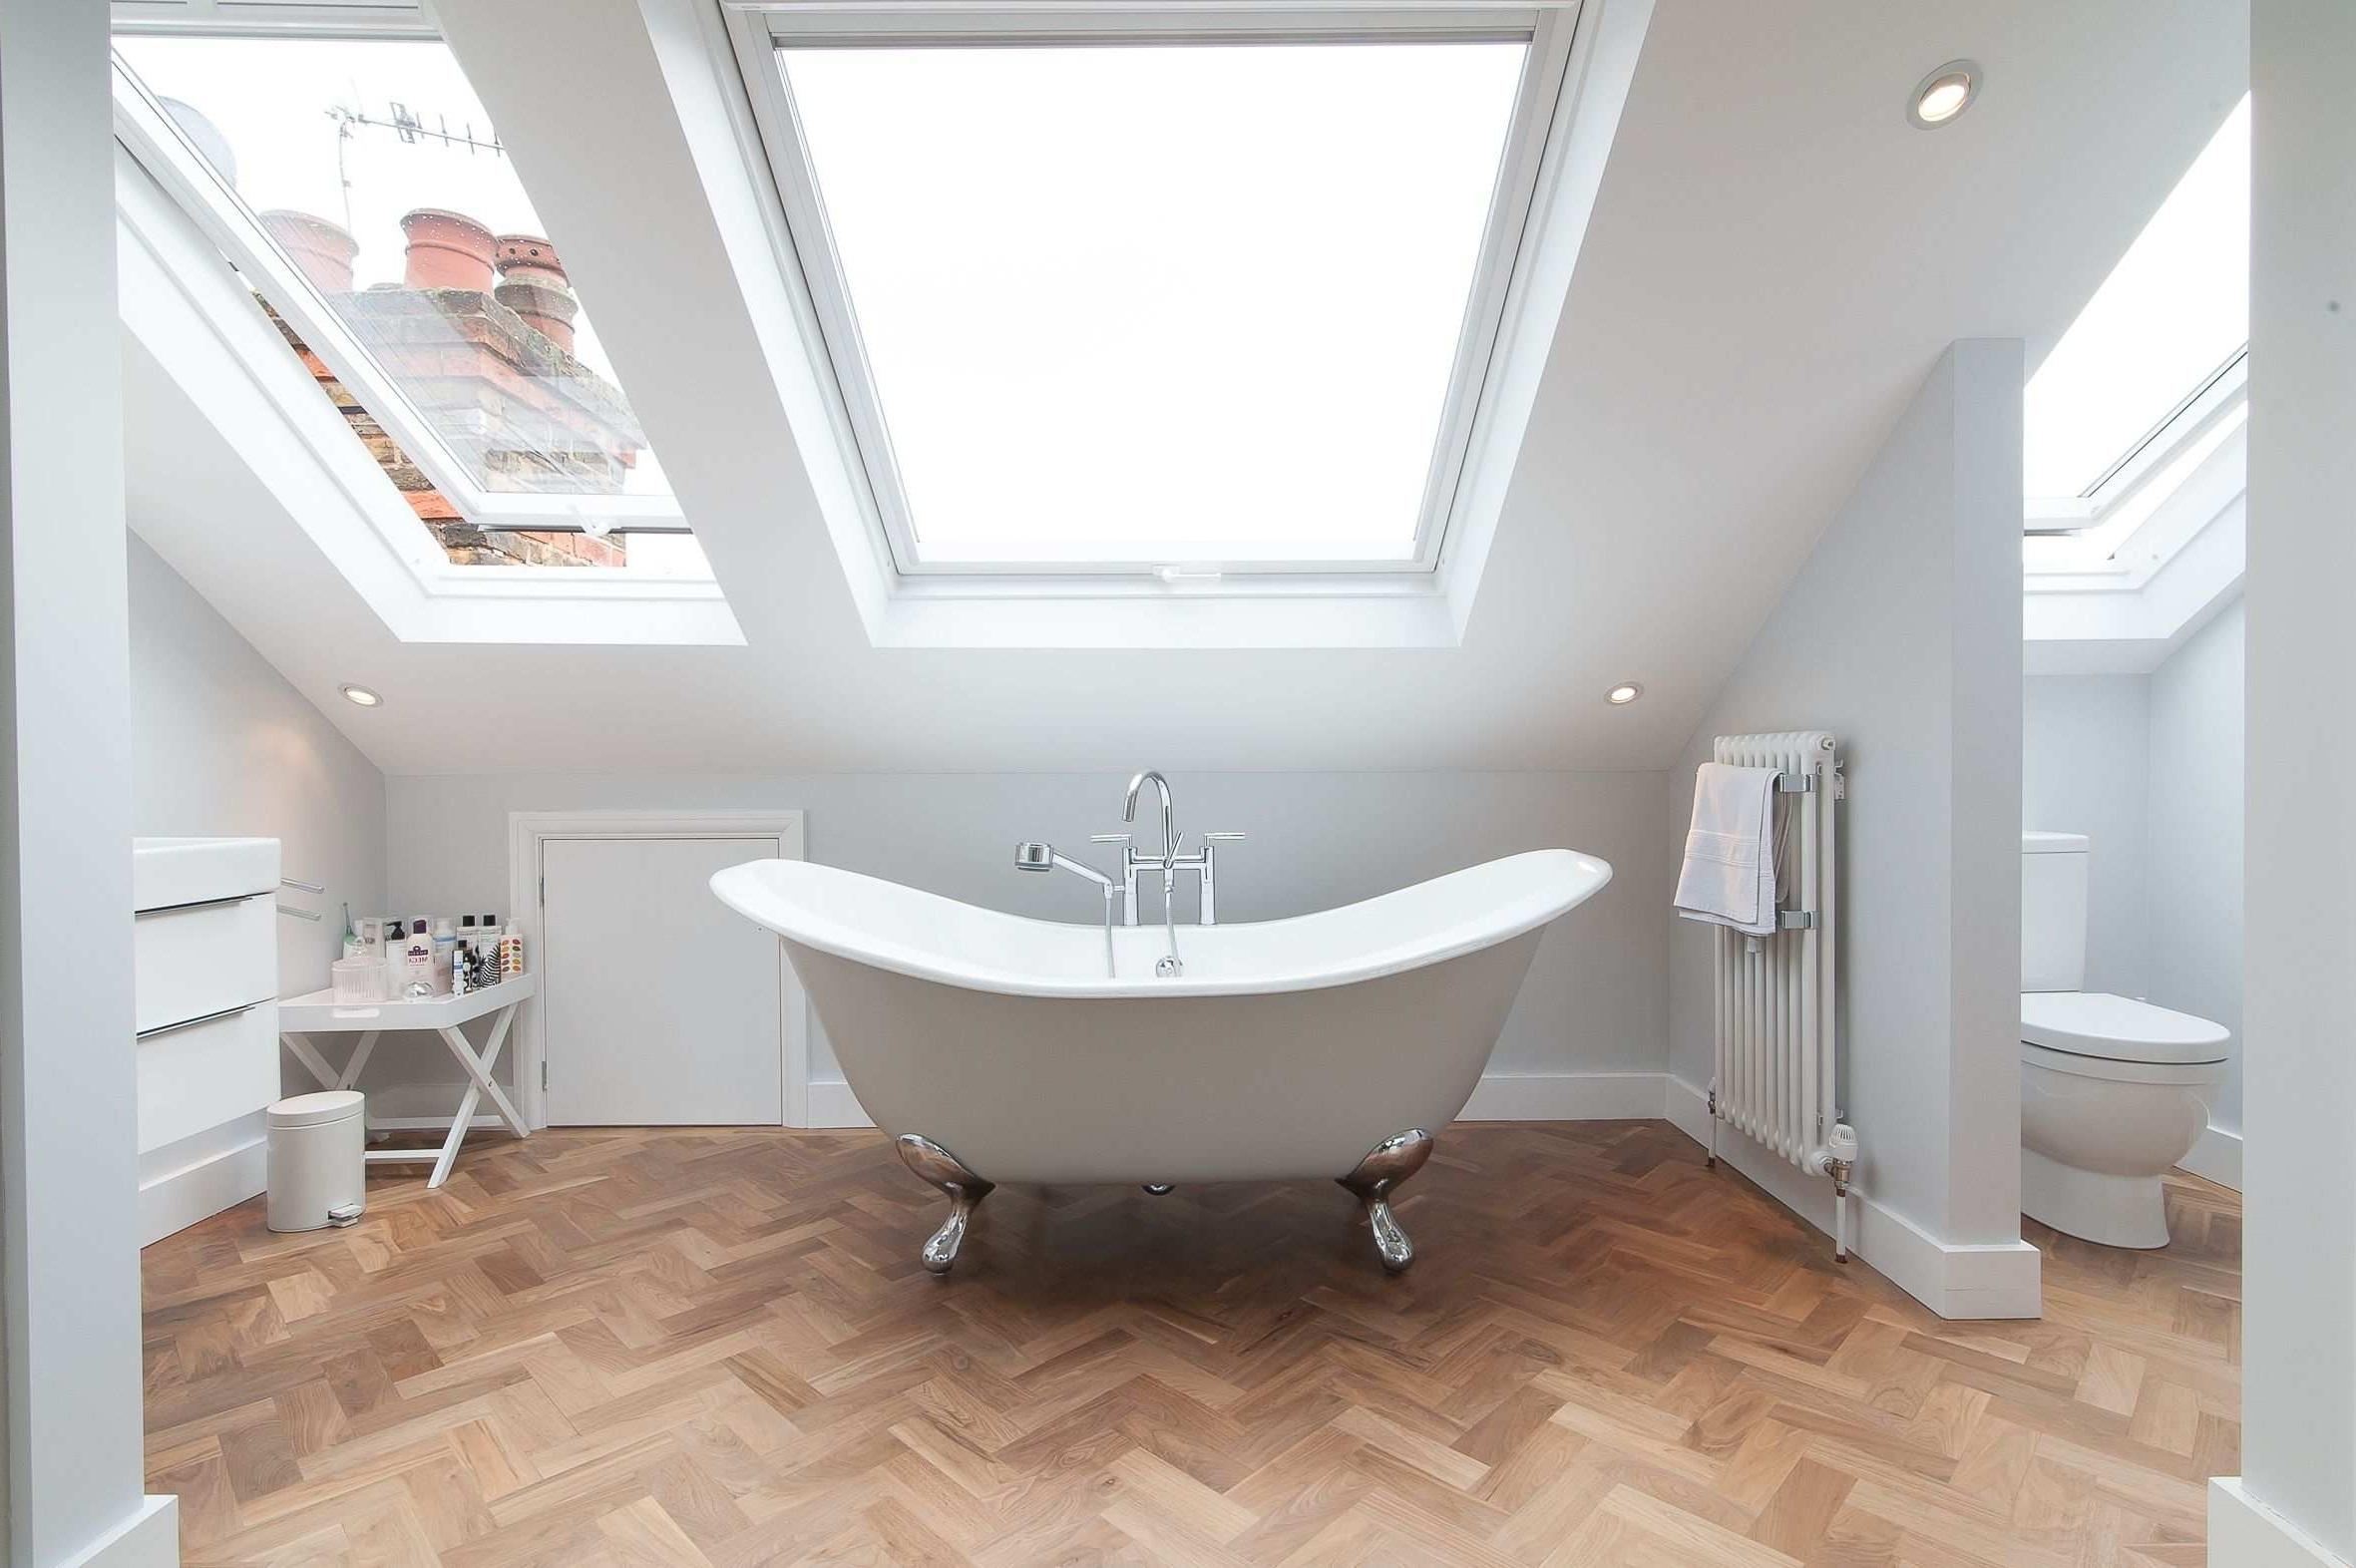 Salle de bains minimaliste.